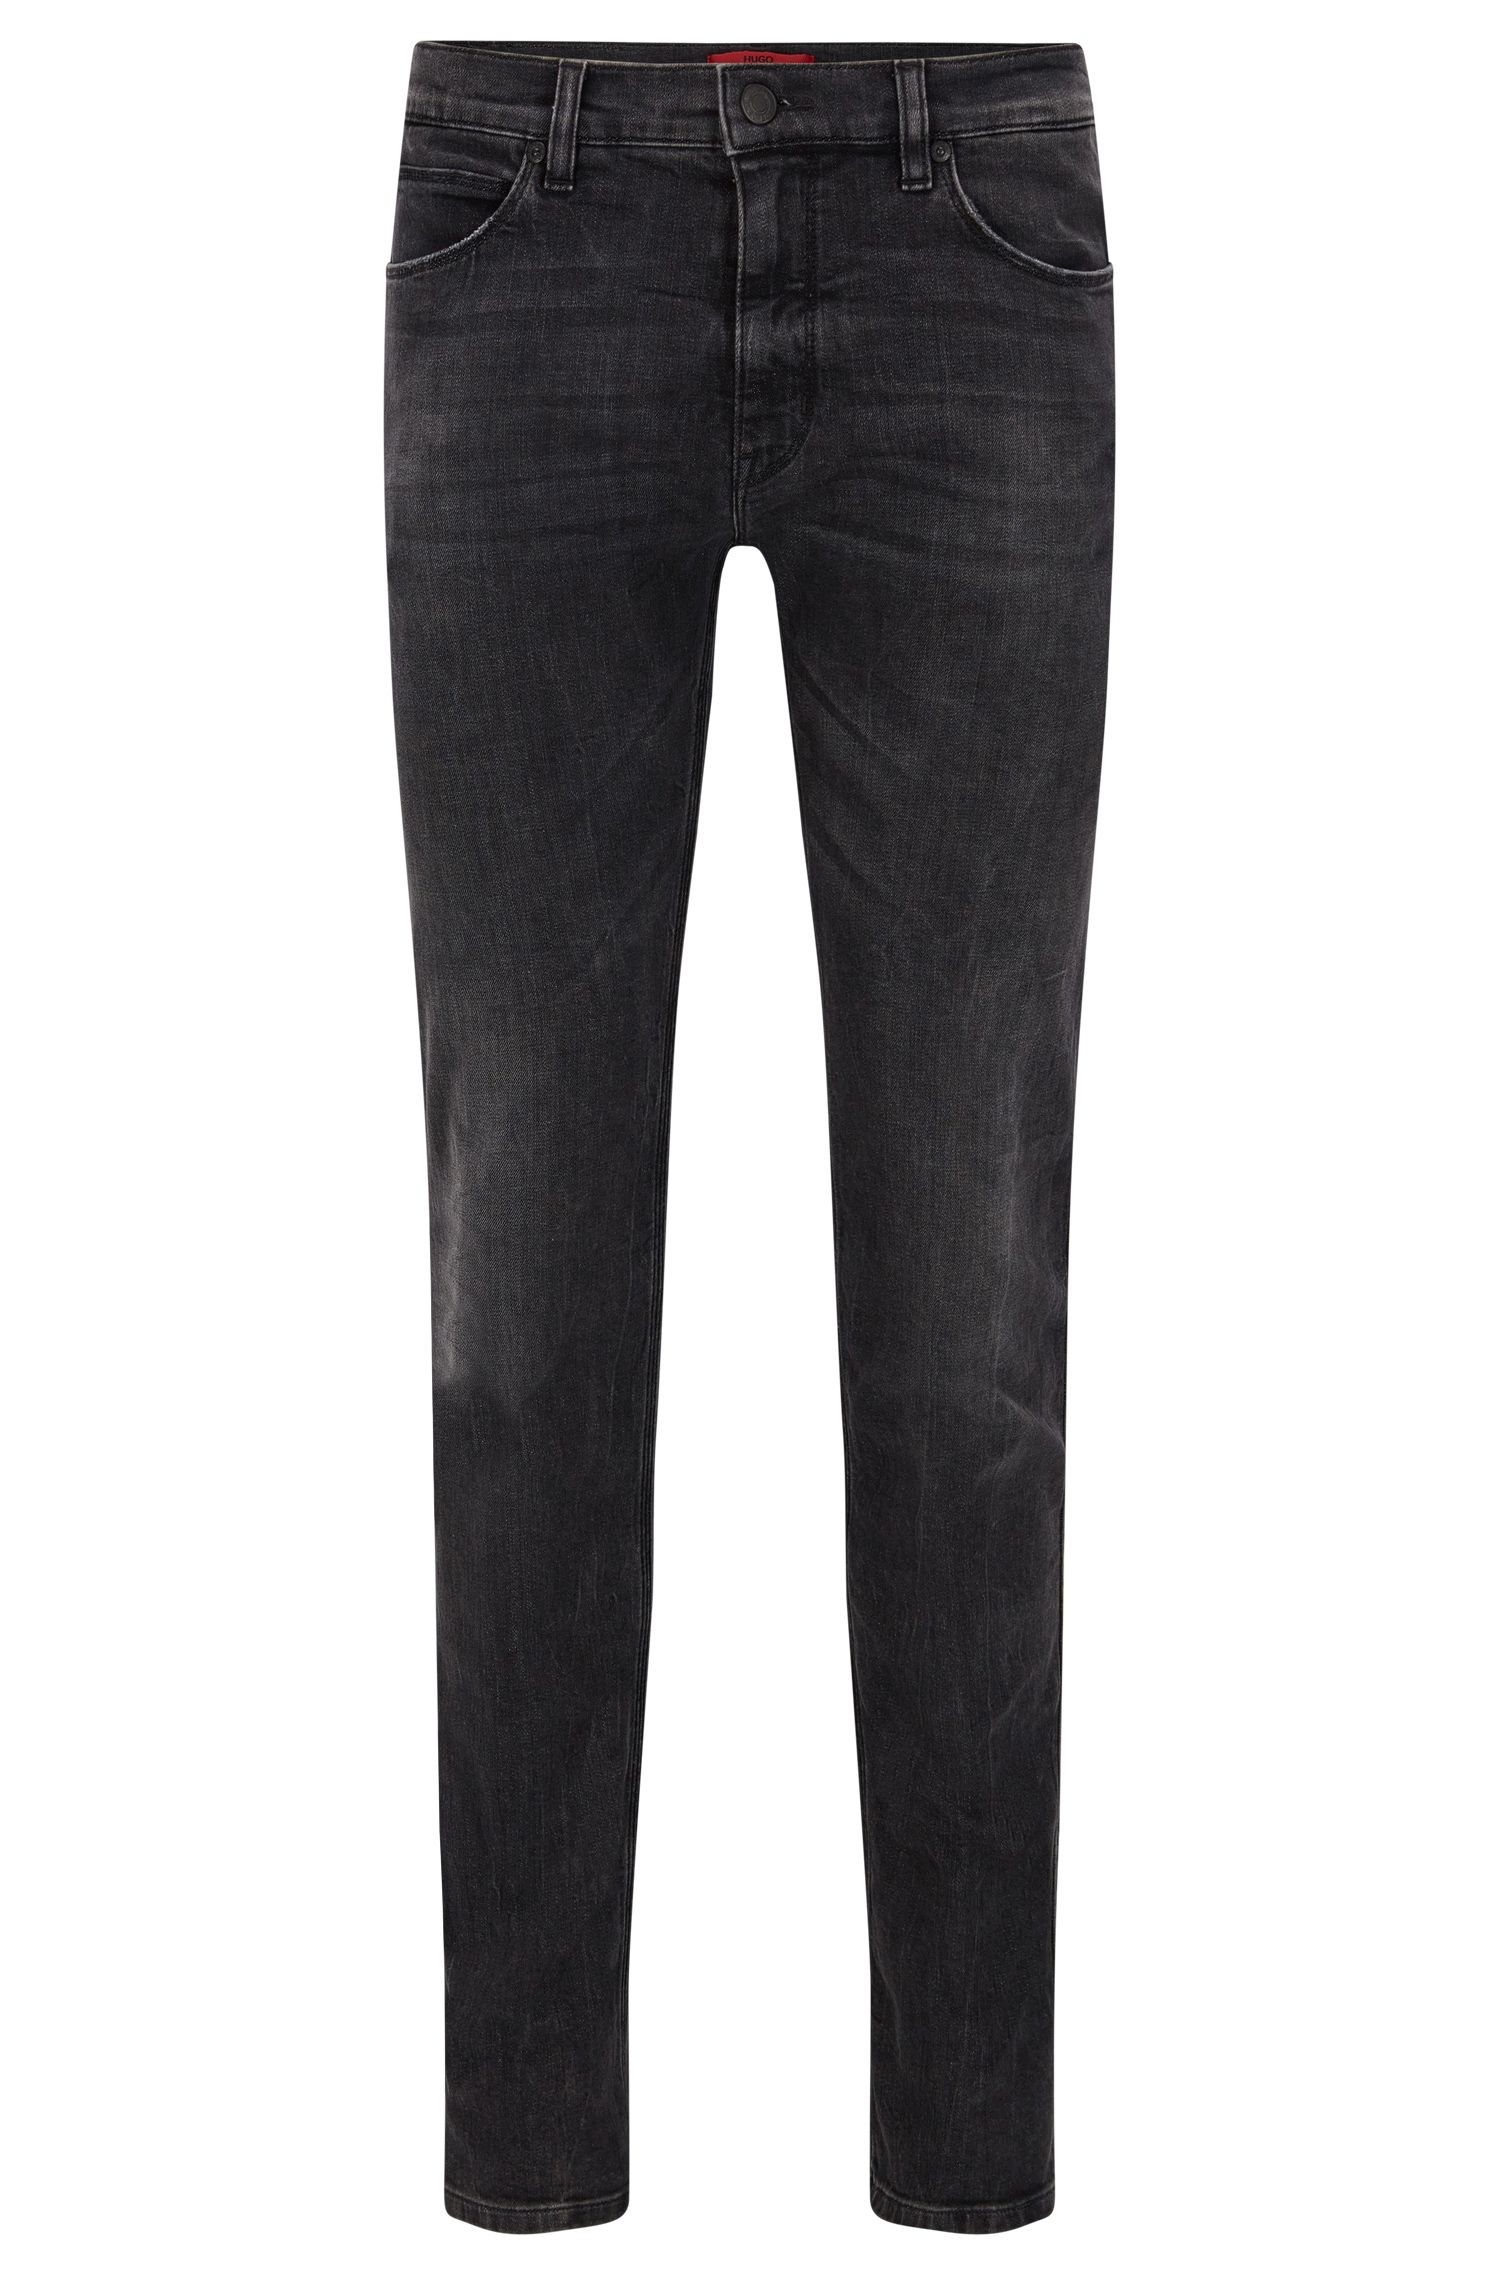 9.5 oz Stretch Cotton Blend Jeans, Slim Fit   Hugo 708